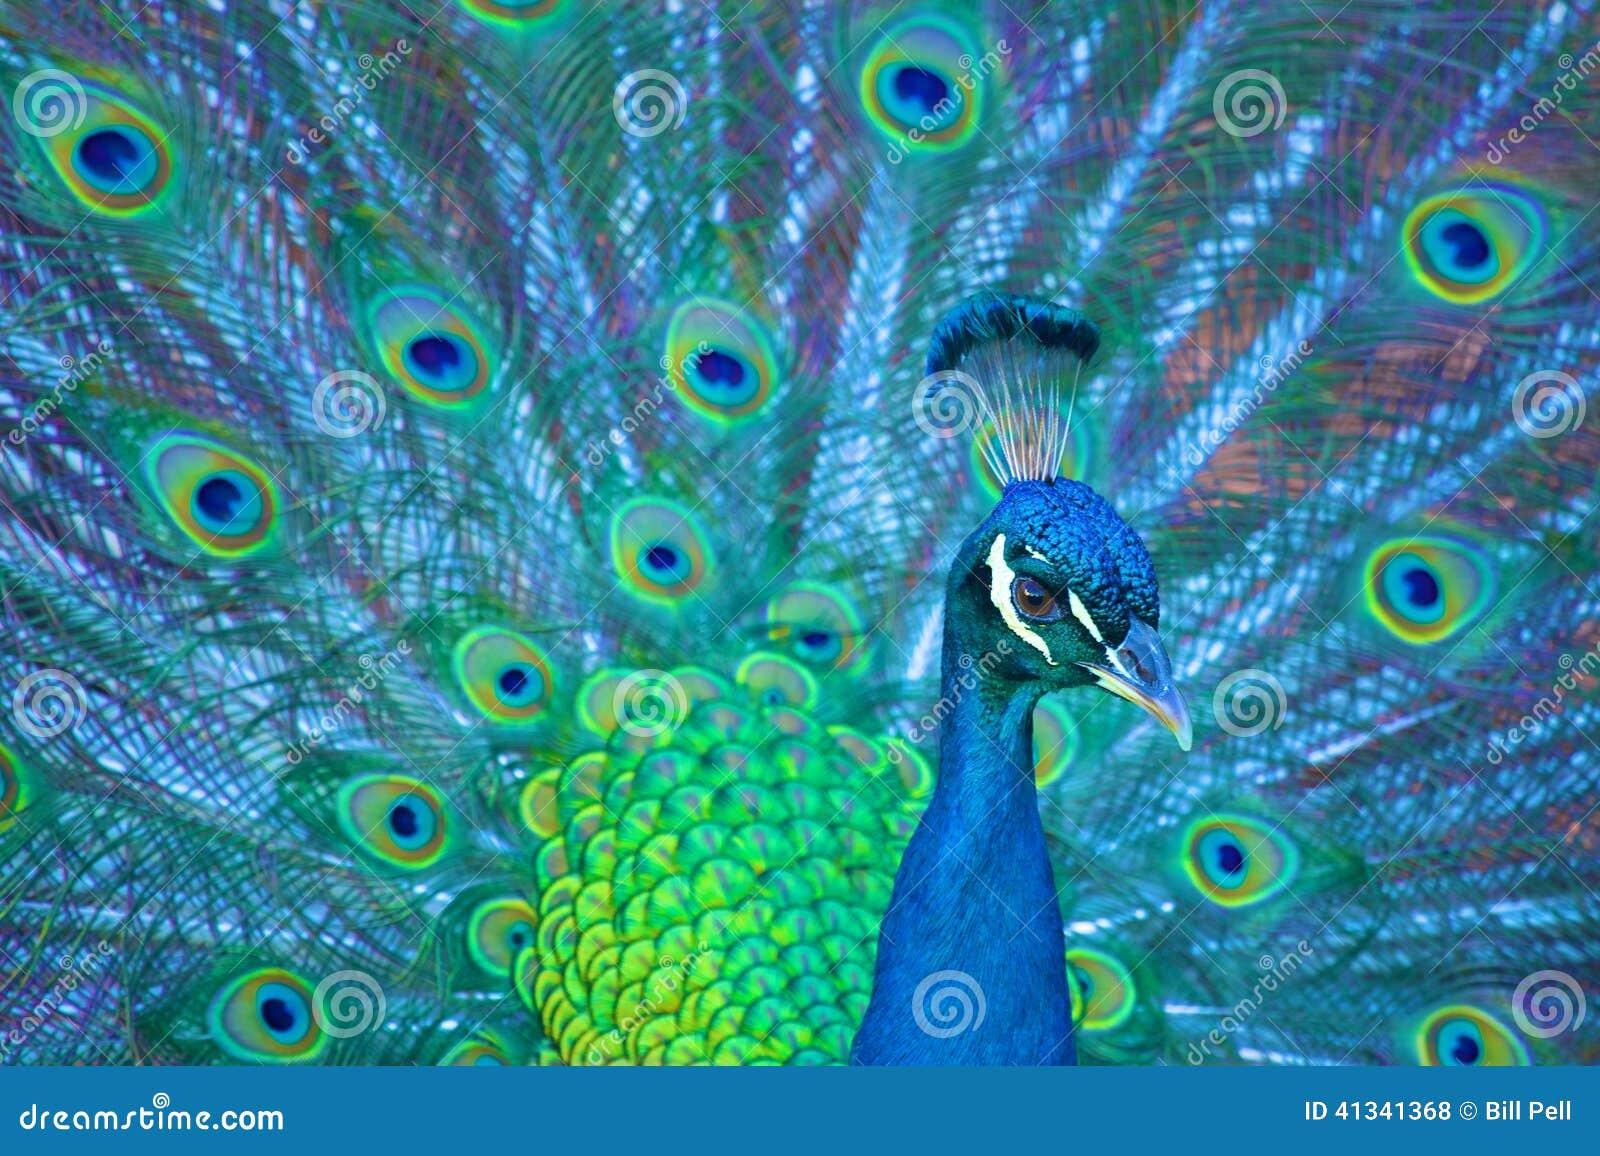 Pretty Peacock Stock Photo Image 41341368